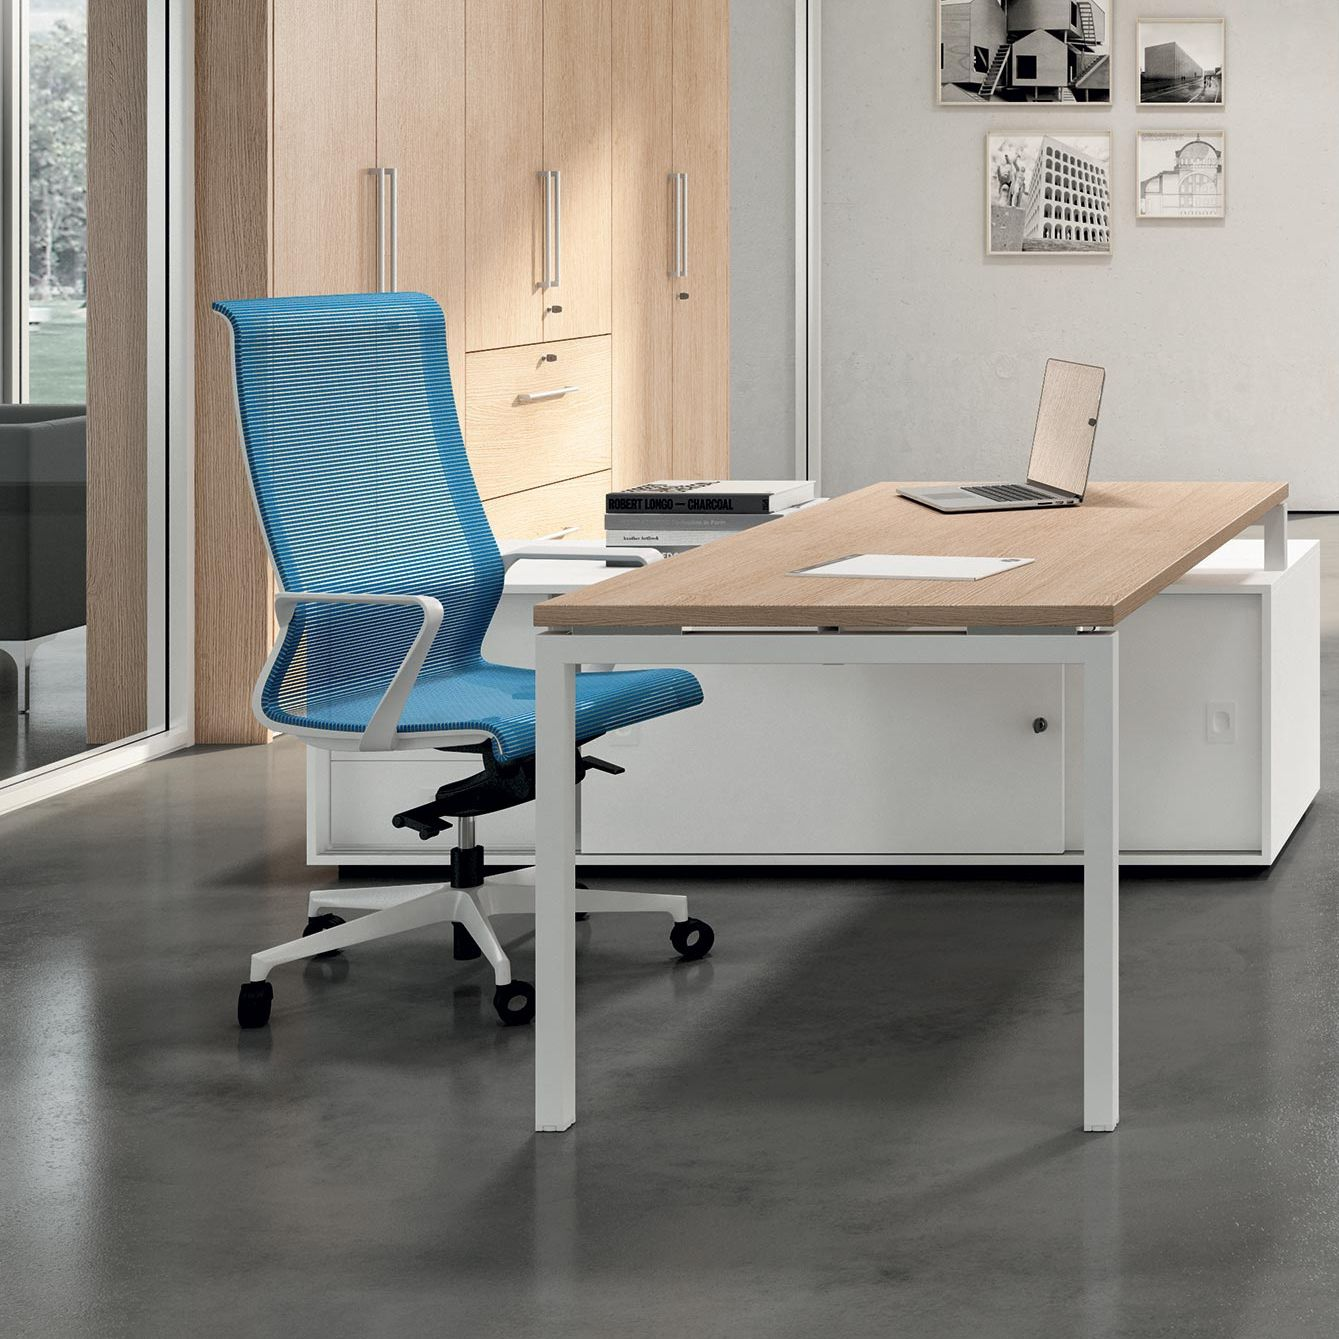 Contemporary Executive Chair Dinamica Quadrifoglio Sistemi D Arredo Mesh Polished Aluminum With Headrest